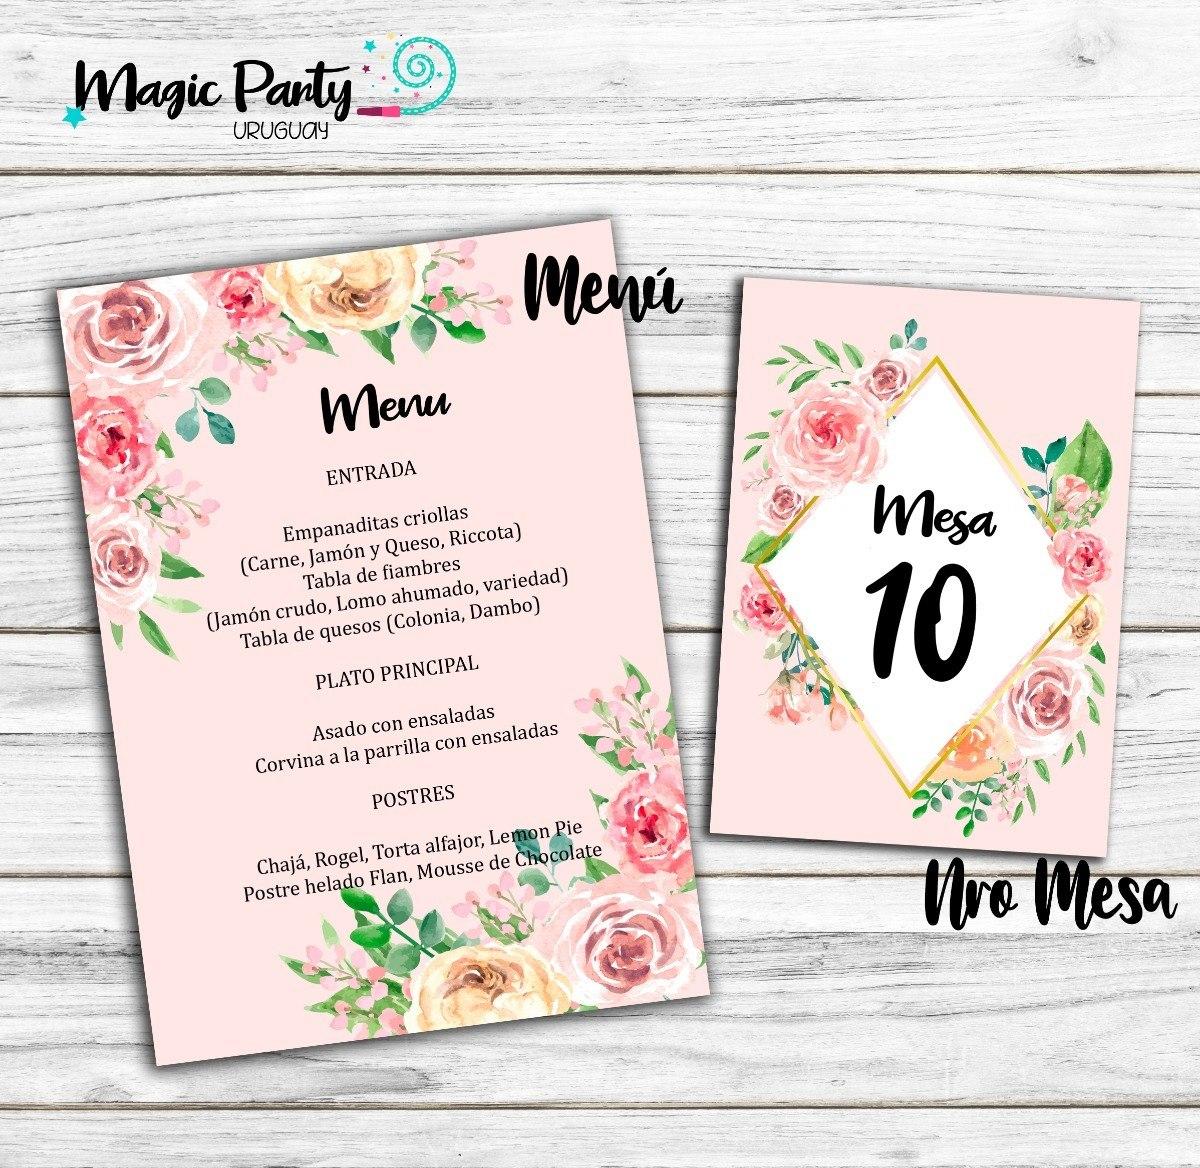 Pack Digital Boda Invitacion Tarjeta Souvenir Nro Mesa Menu